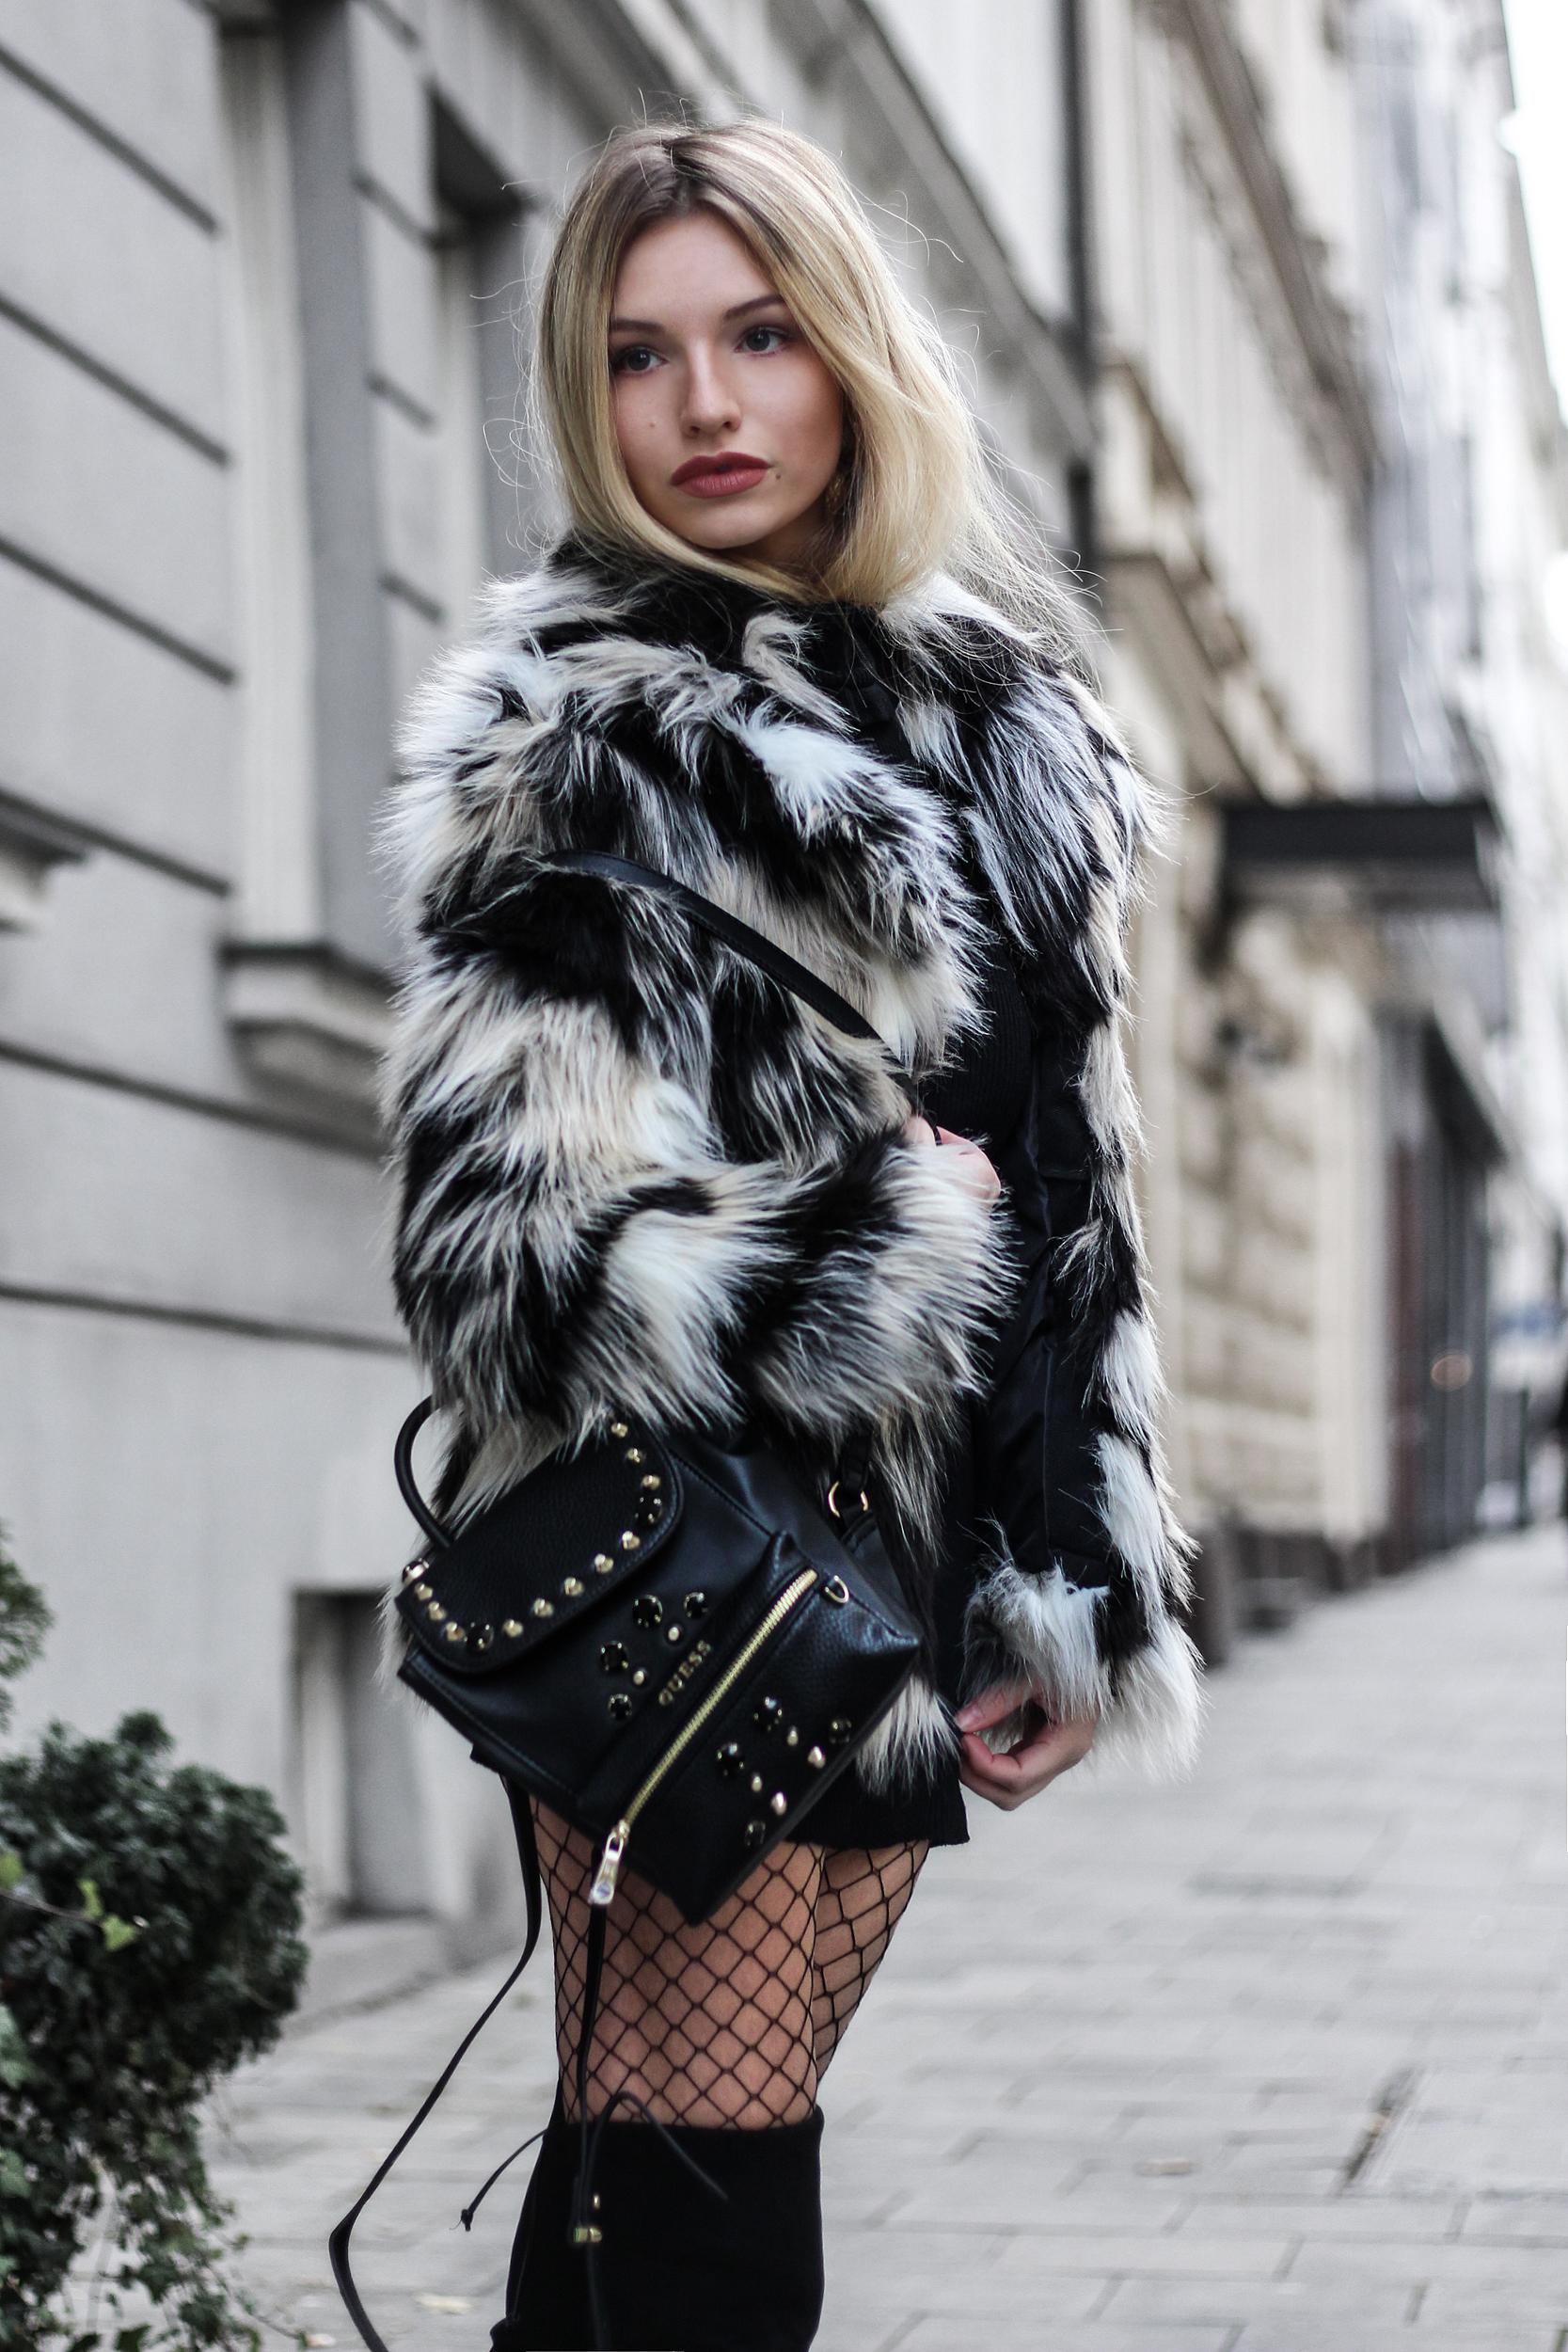 franziska-elea-blogger-aus-muenchen-fake-fur-jacke-netzstrumpfhose-overknee-stiefel-guess-rucksack-felljacke-jacke-aus-kunstfell-modeblogger